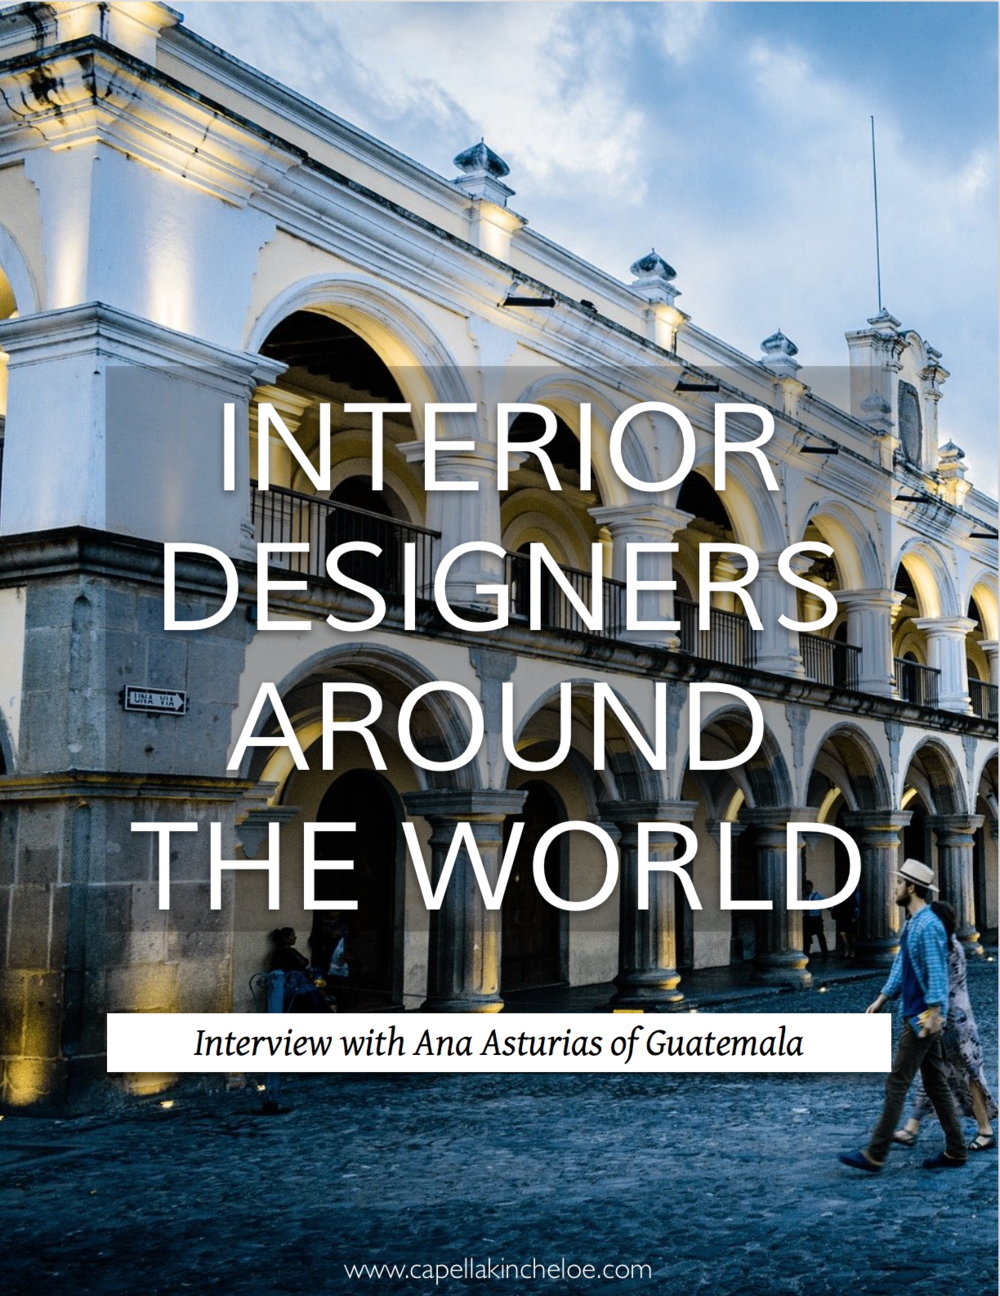 Get a peek inside interior design studios across the world. #interiordesignbusiness #cktradesecrets #designersaroundtheworld